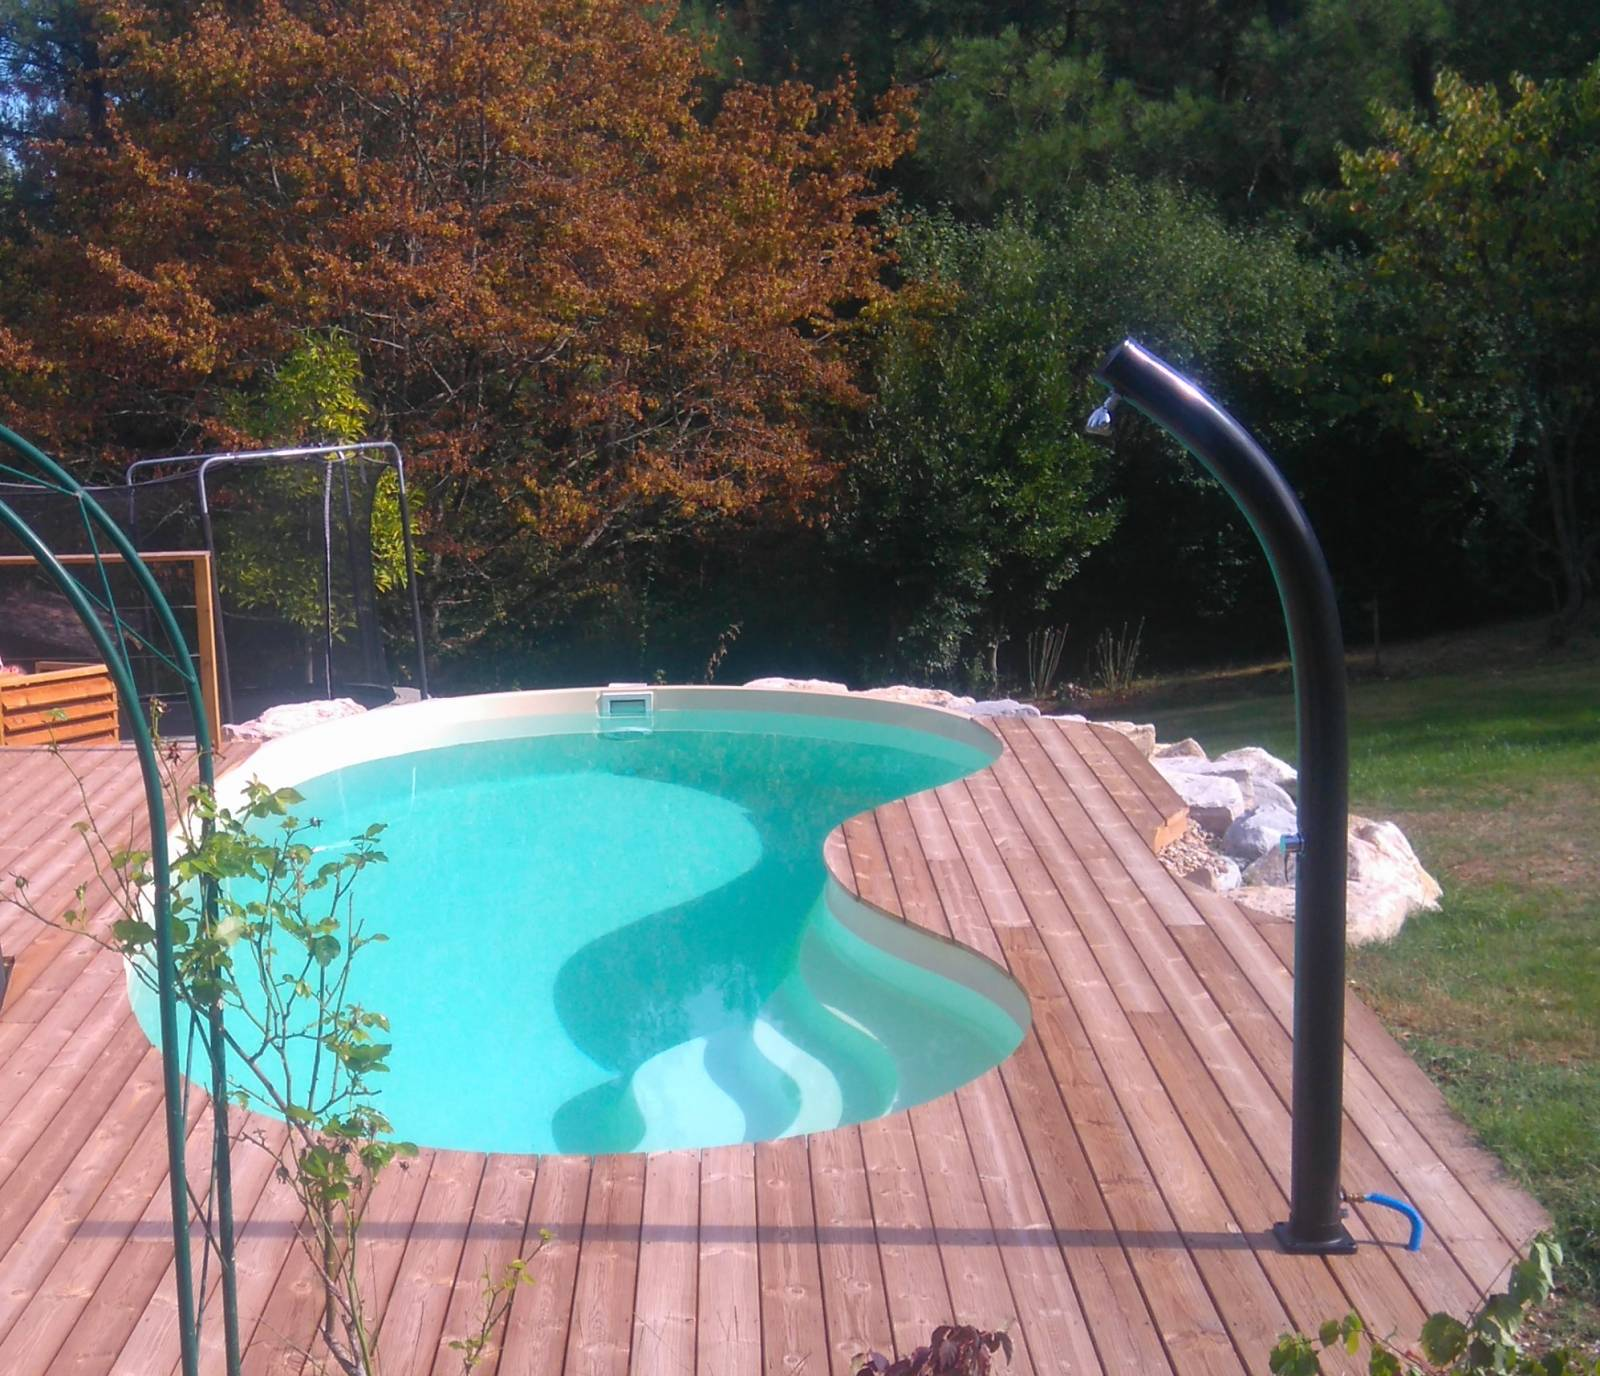 PISCINES COQUES POLYESTER ATYPIQUE PENTE DOUCE FORME HARICOT RINON 65 GIRONDE - Achat de piscine ...